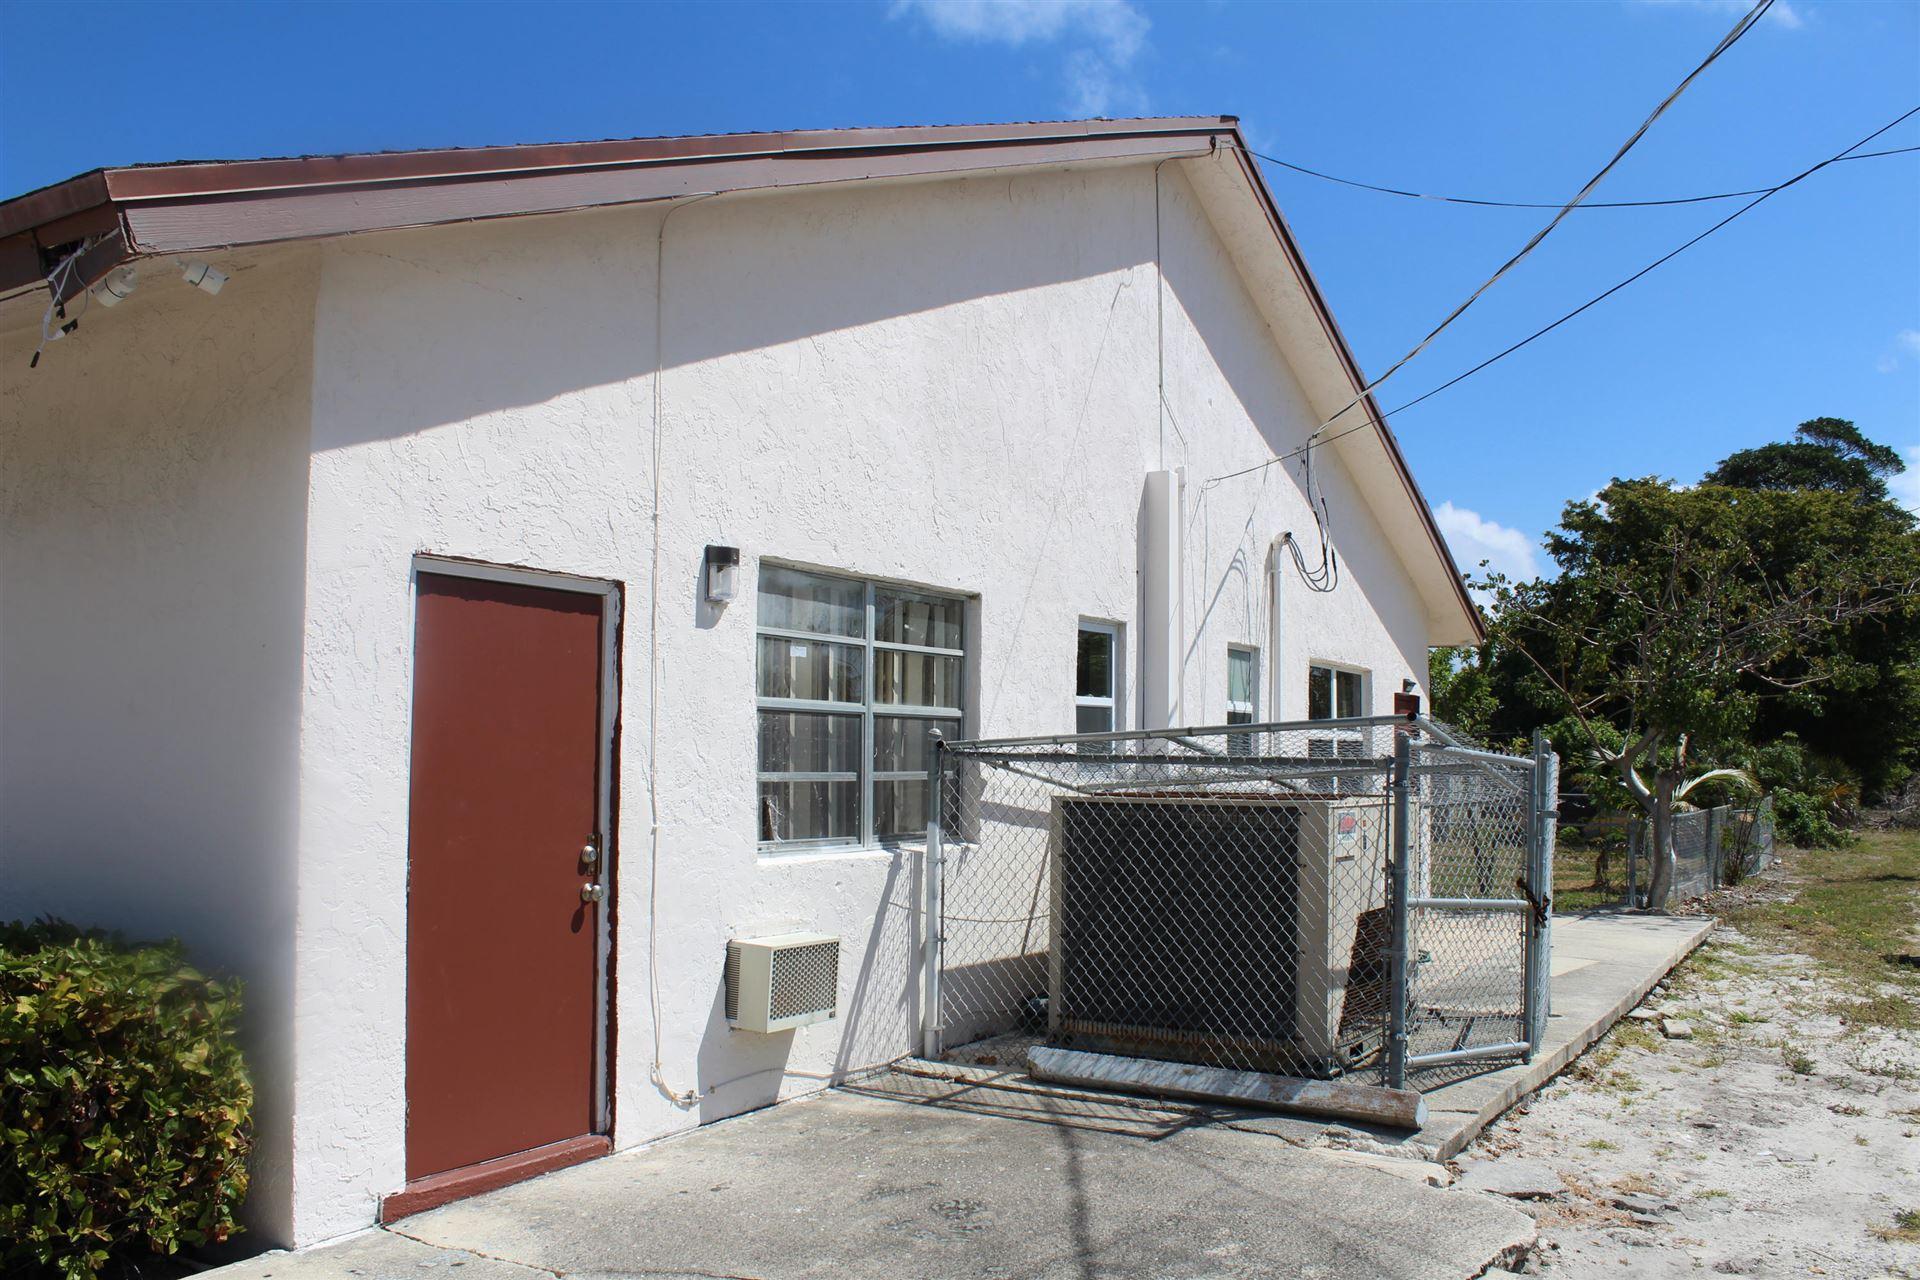 Photo of 560 W Martin Luther King Jr Boulevard W, Boynton Beach, FL 33435 (MLS # RX-10614560)